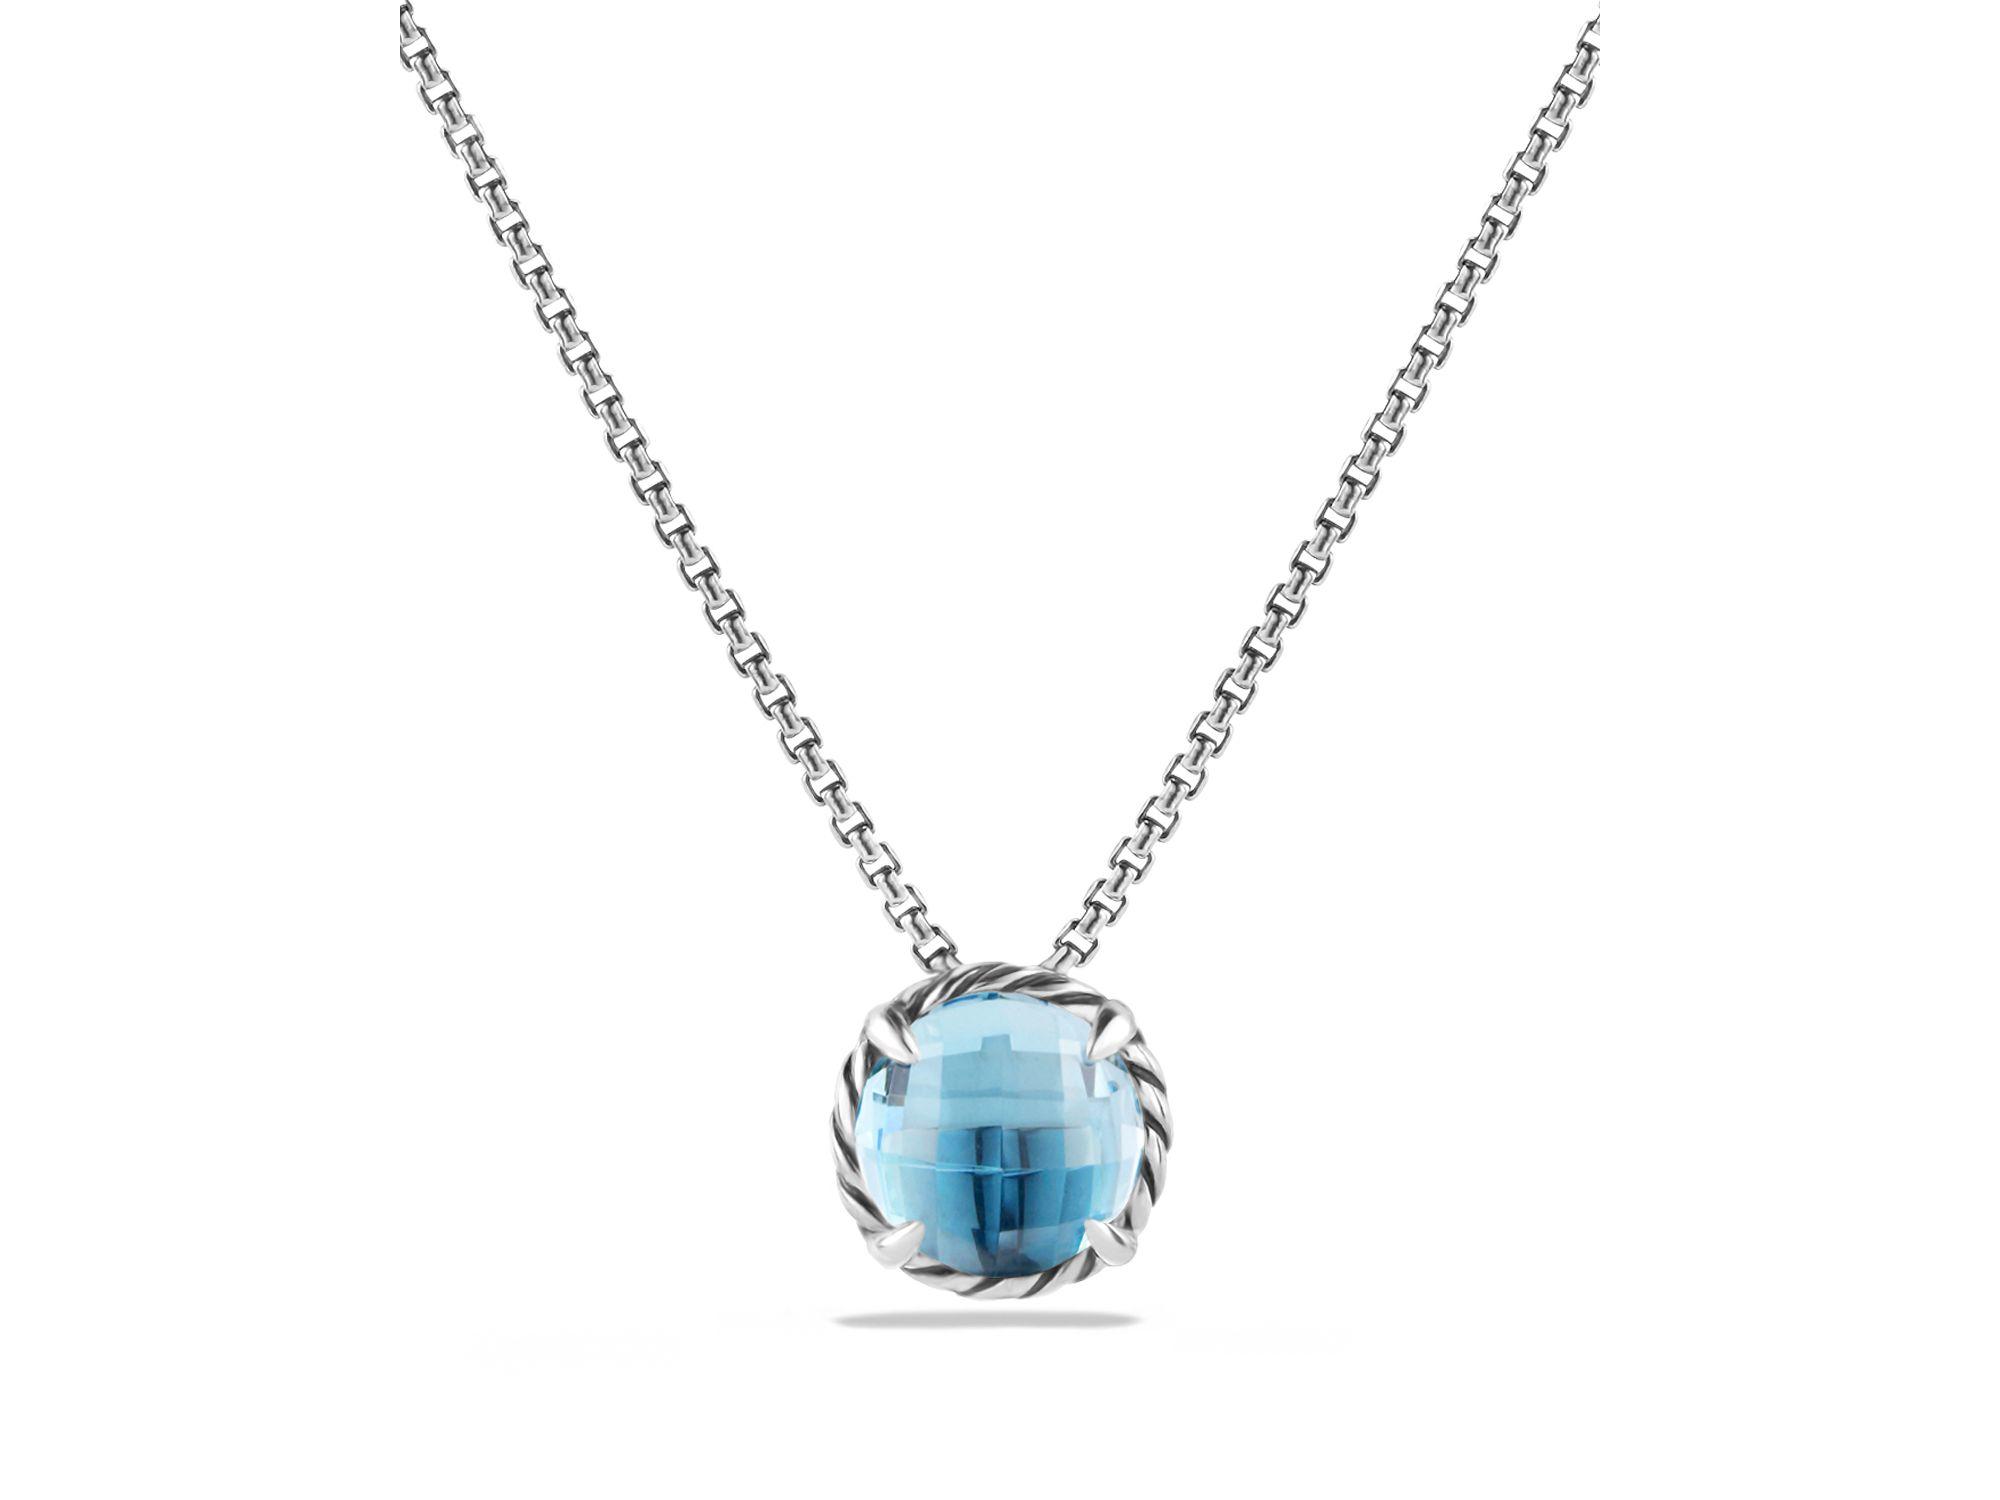 david yurman chatelaine pendant necklace with blue topaz